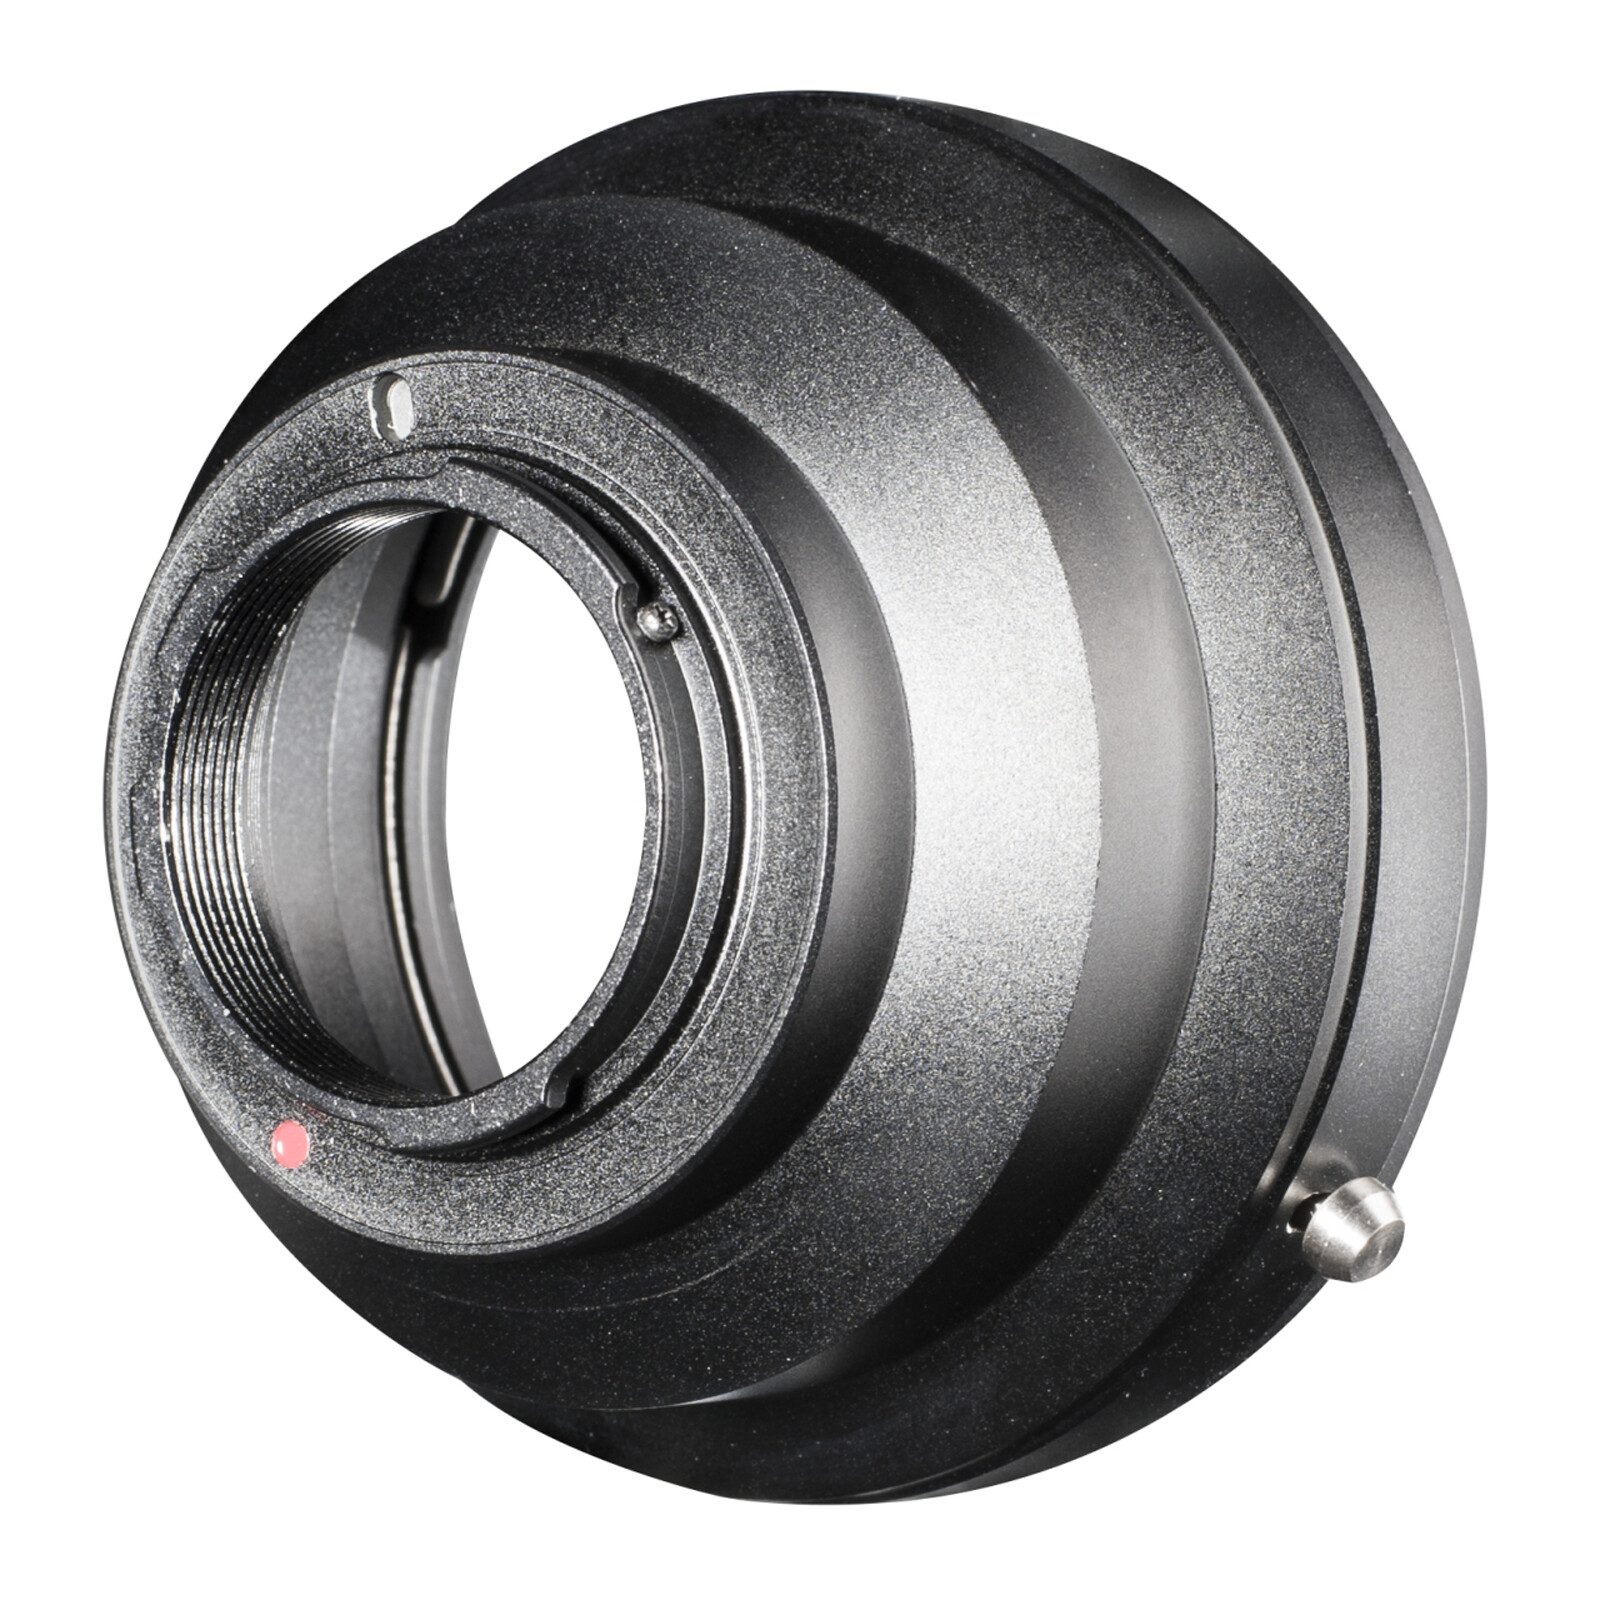 Kipon Adapter Canon EOS auf Pentax Q